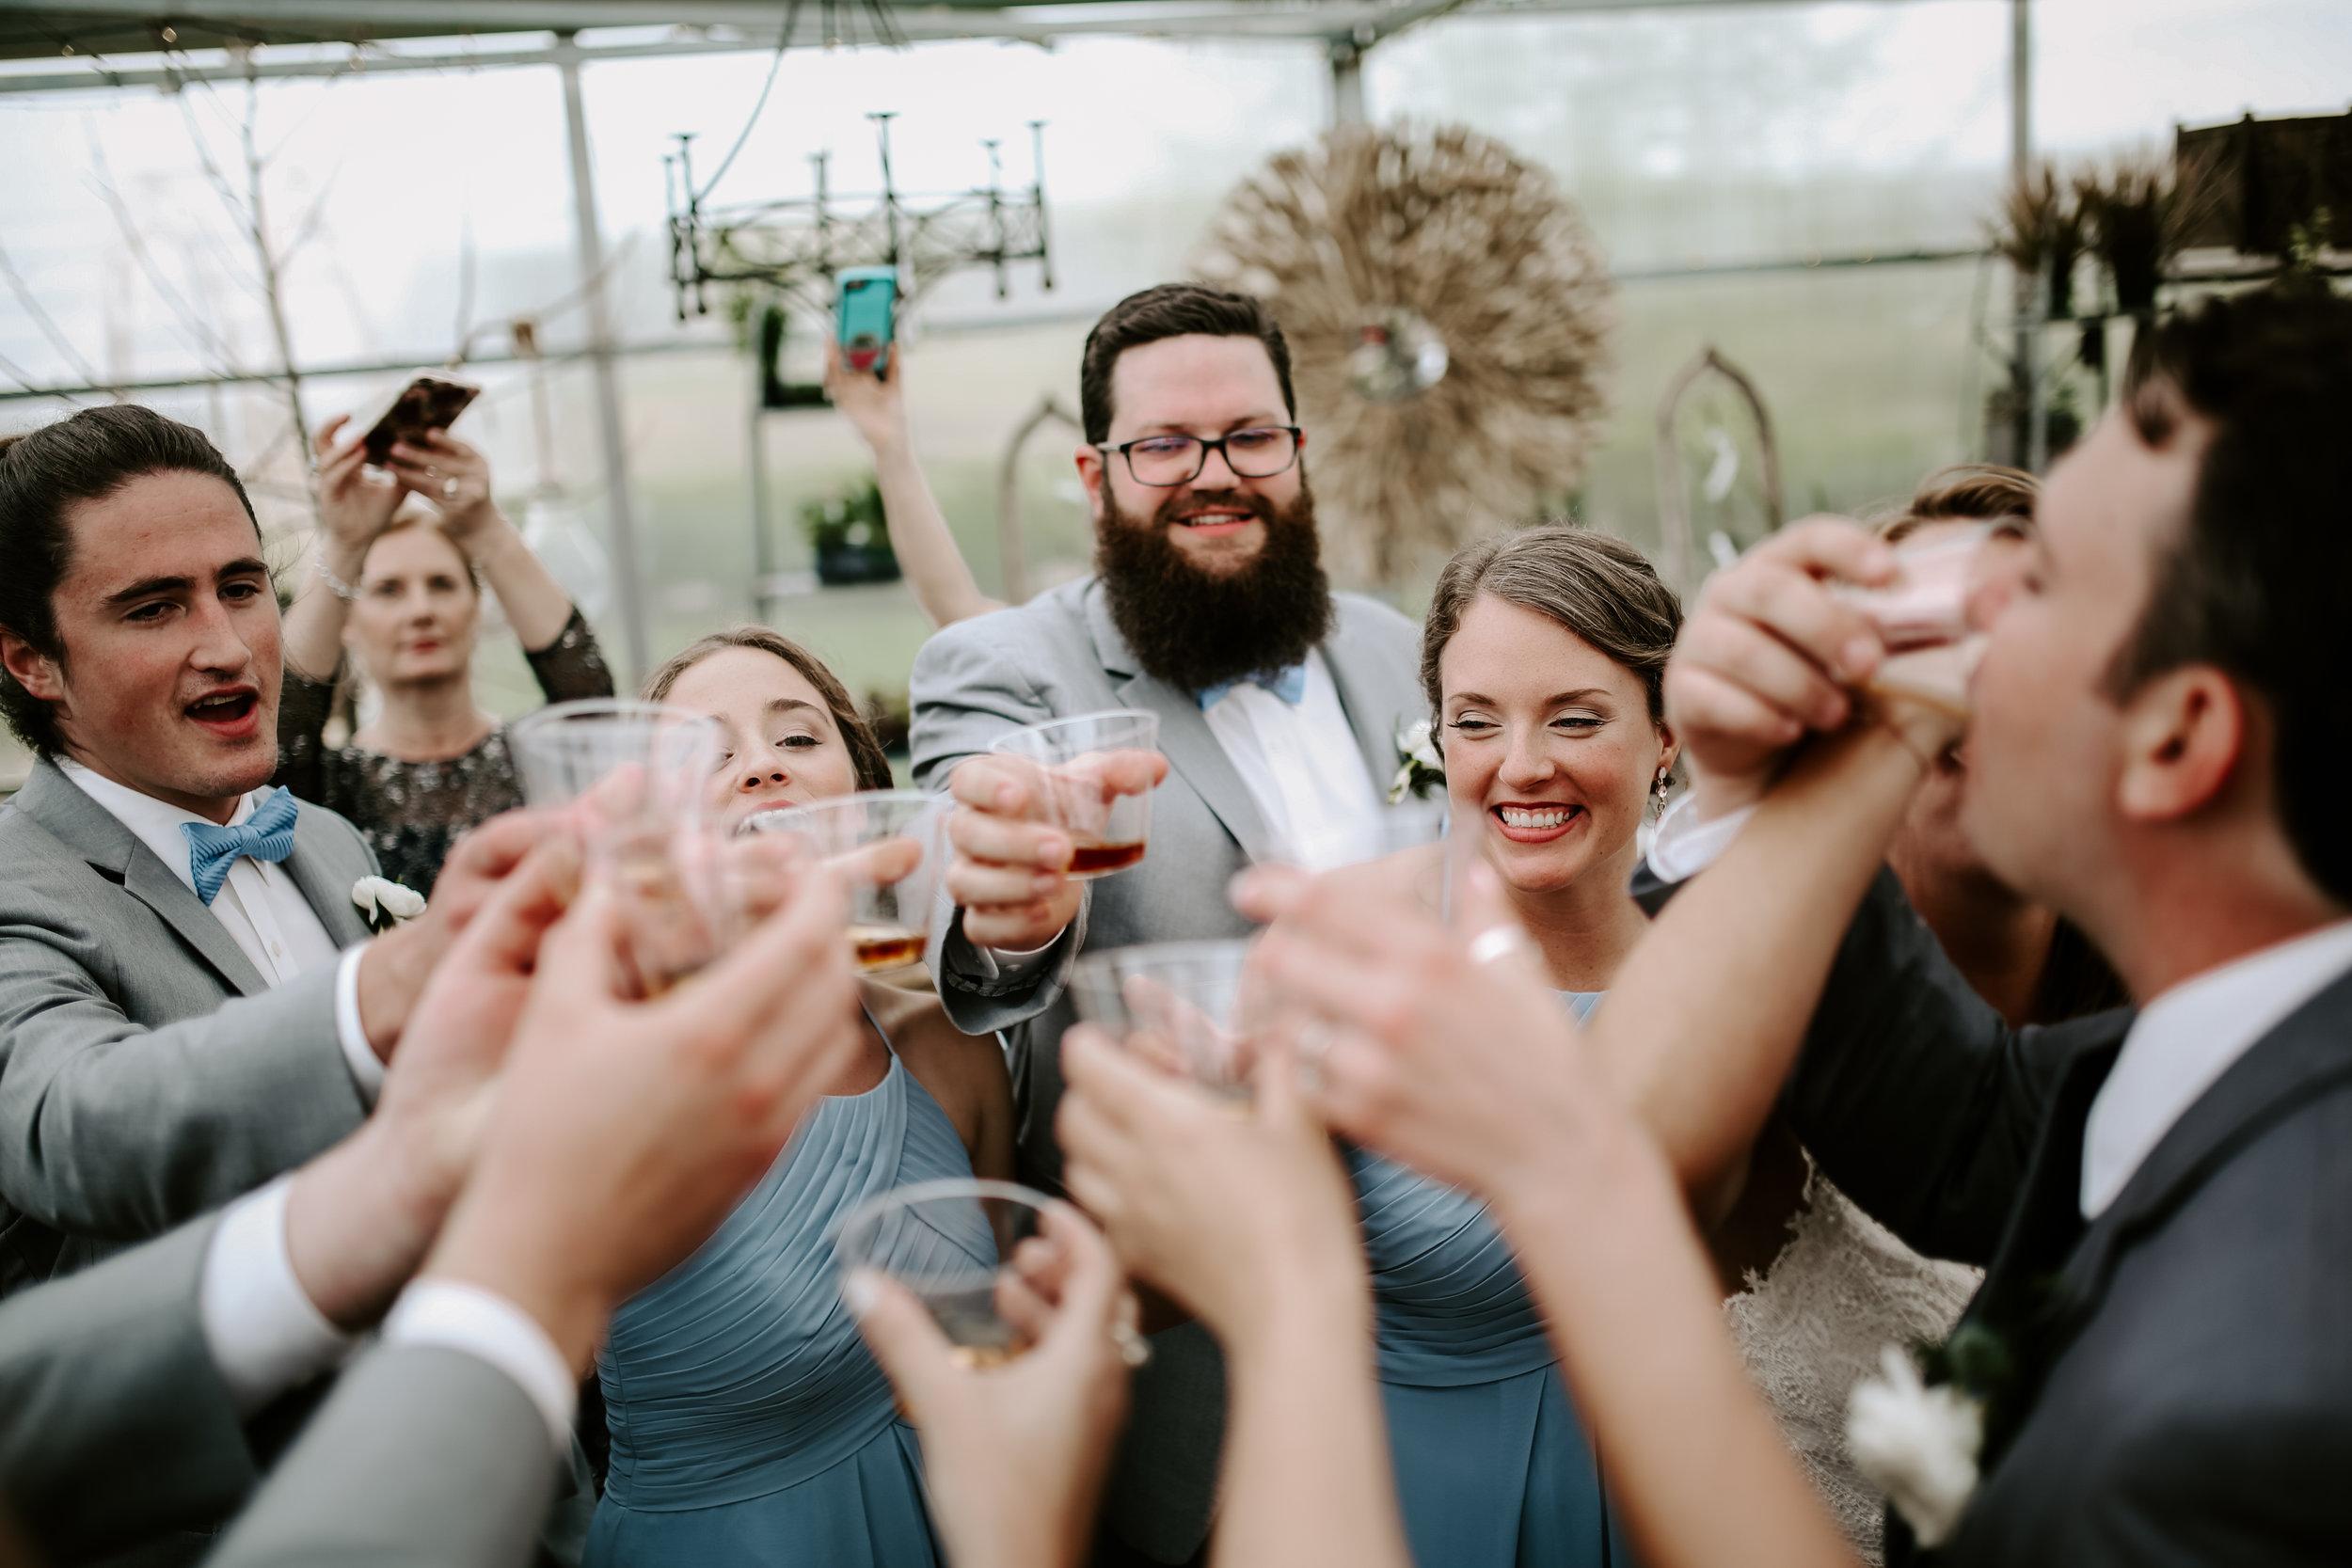 TheGreens_Married_2019-219.jpg